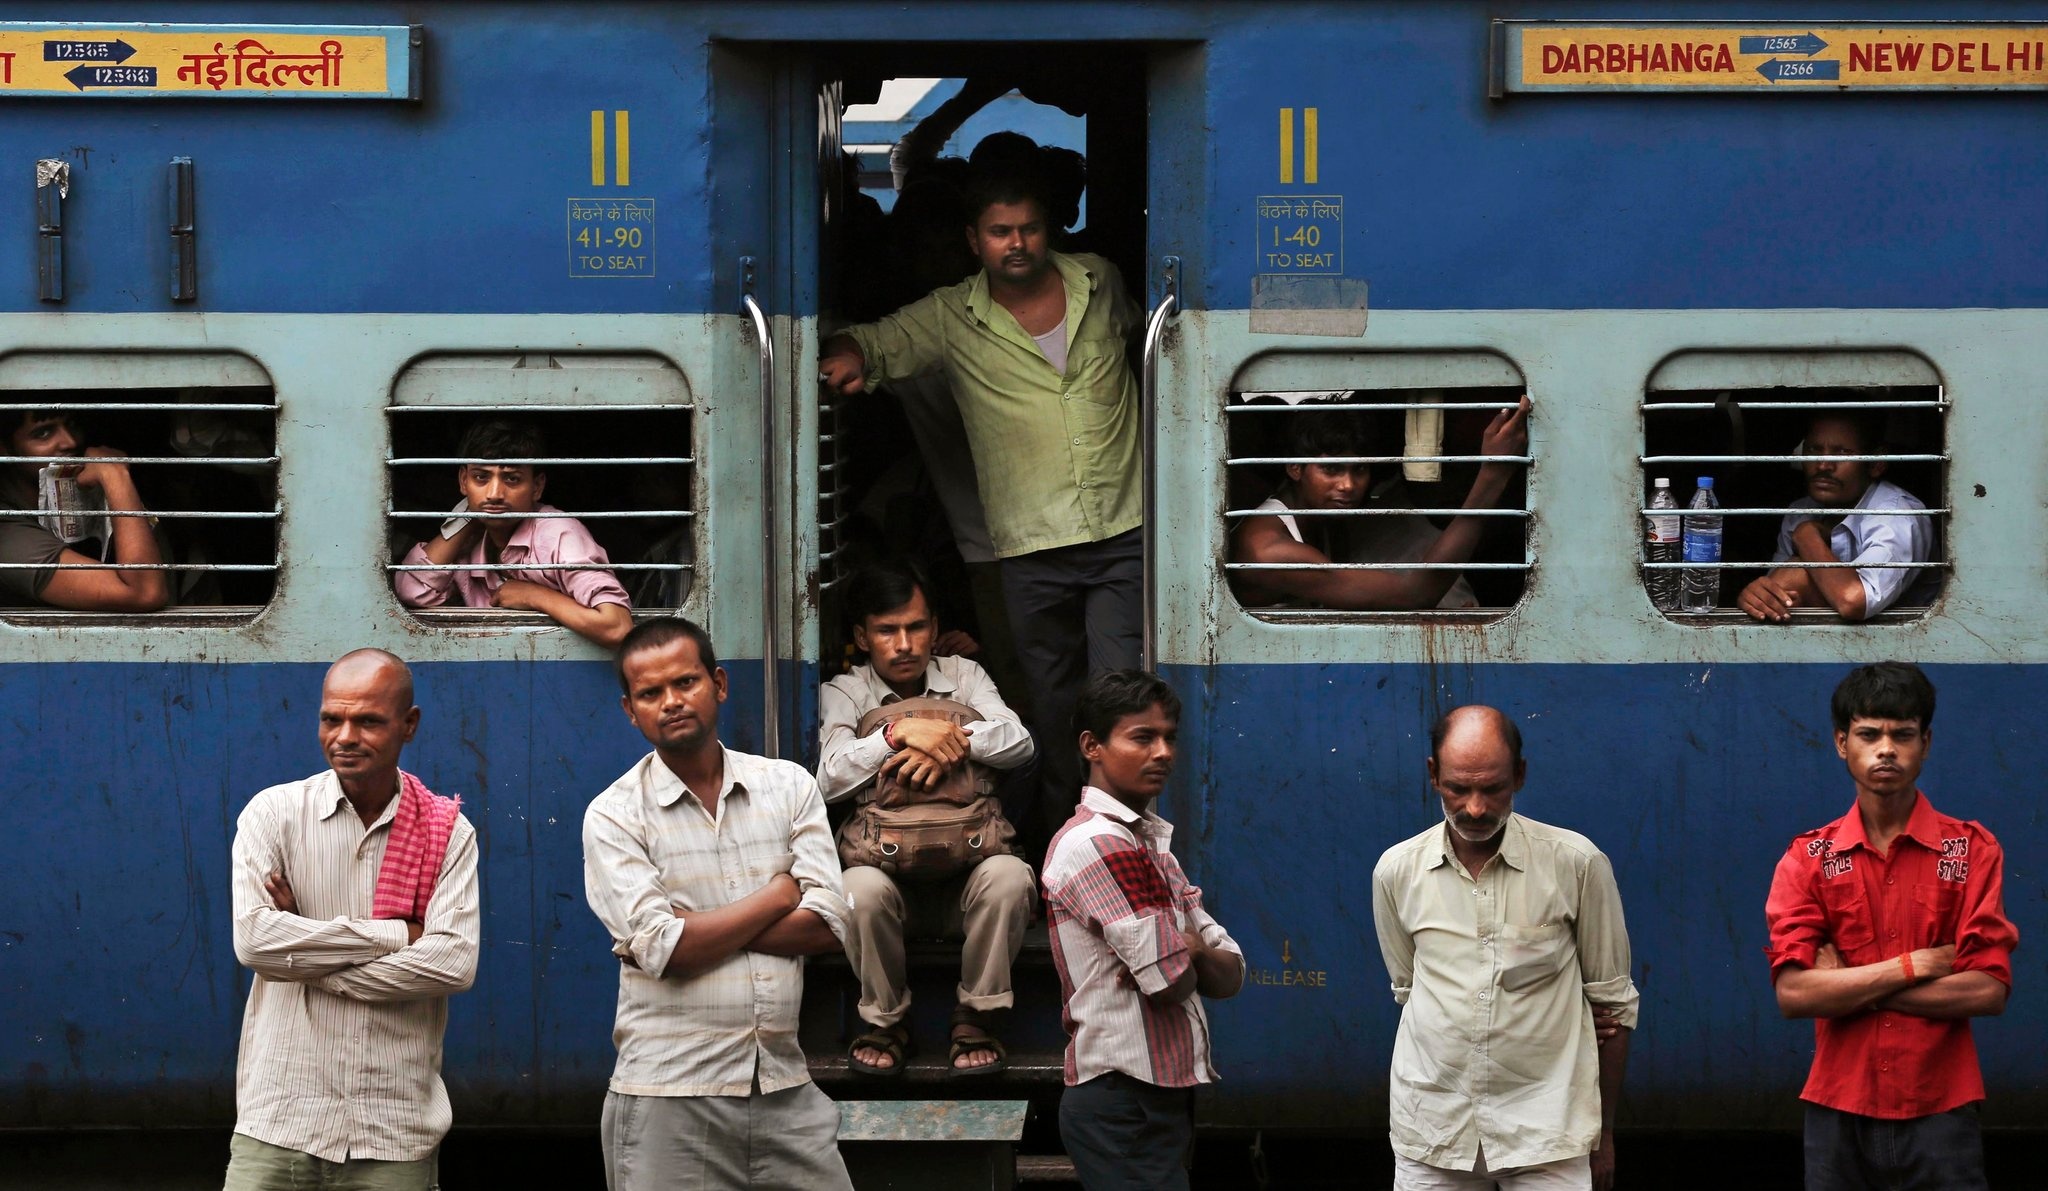 crowded train india delhi